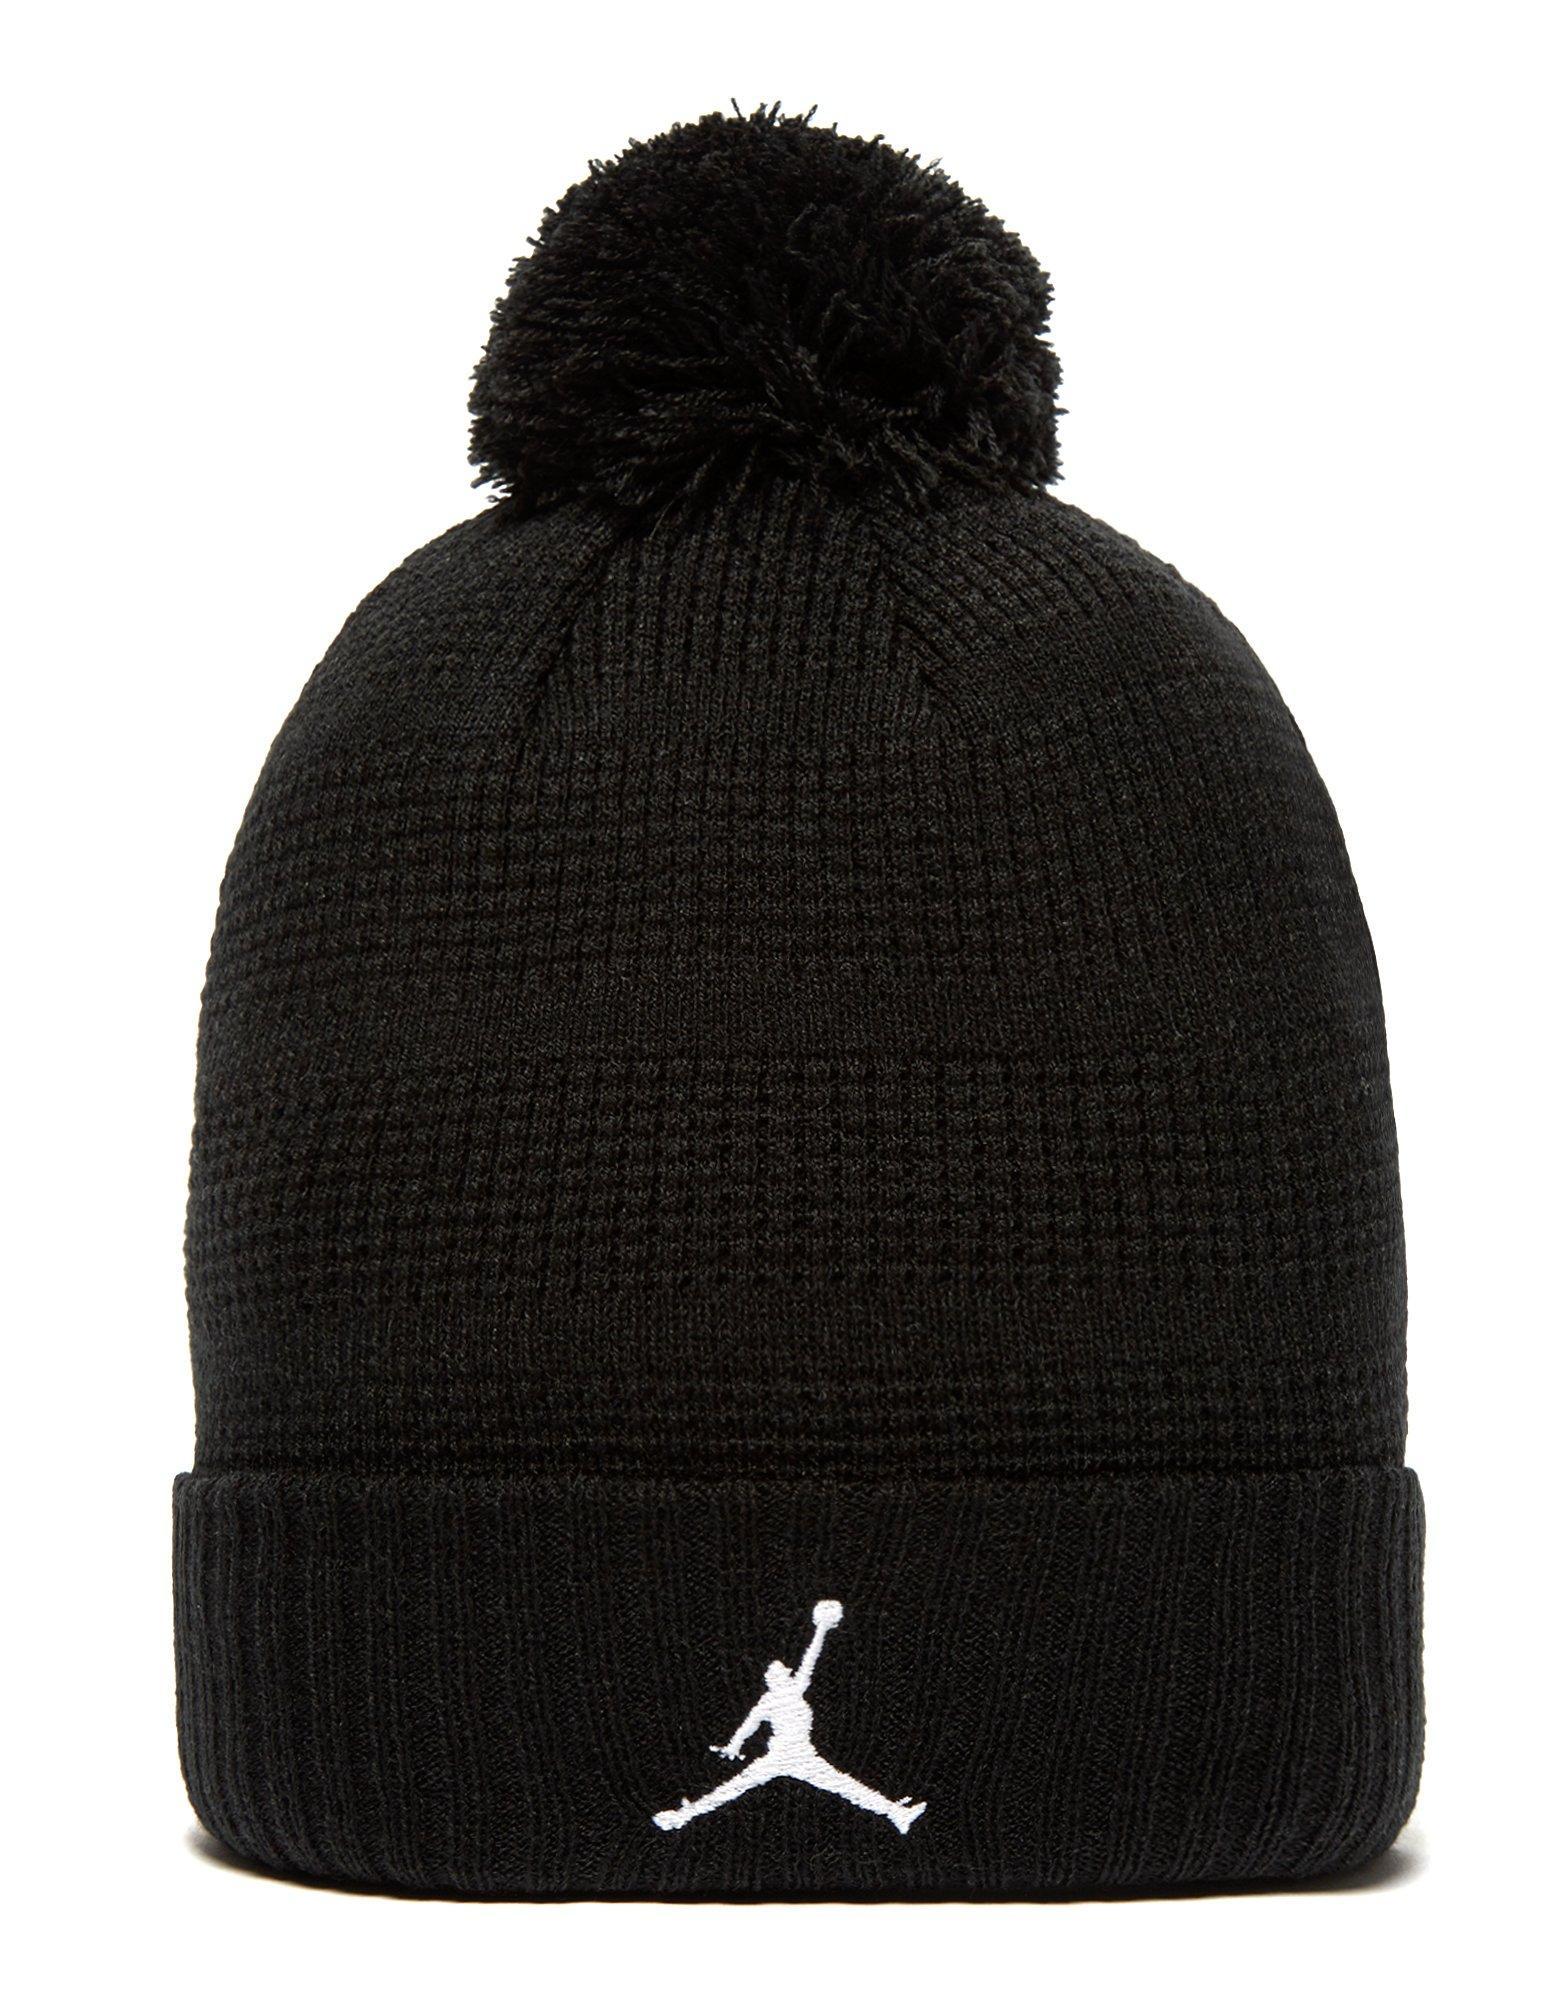 fc8a50316ef ... real australia nicce banff basic beanie hat basketzone nike jordan  beanie 9e75f 171ec low price spacedye